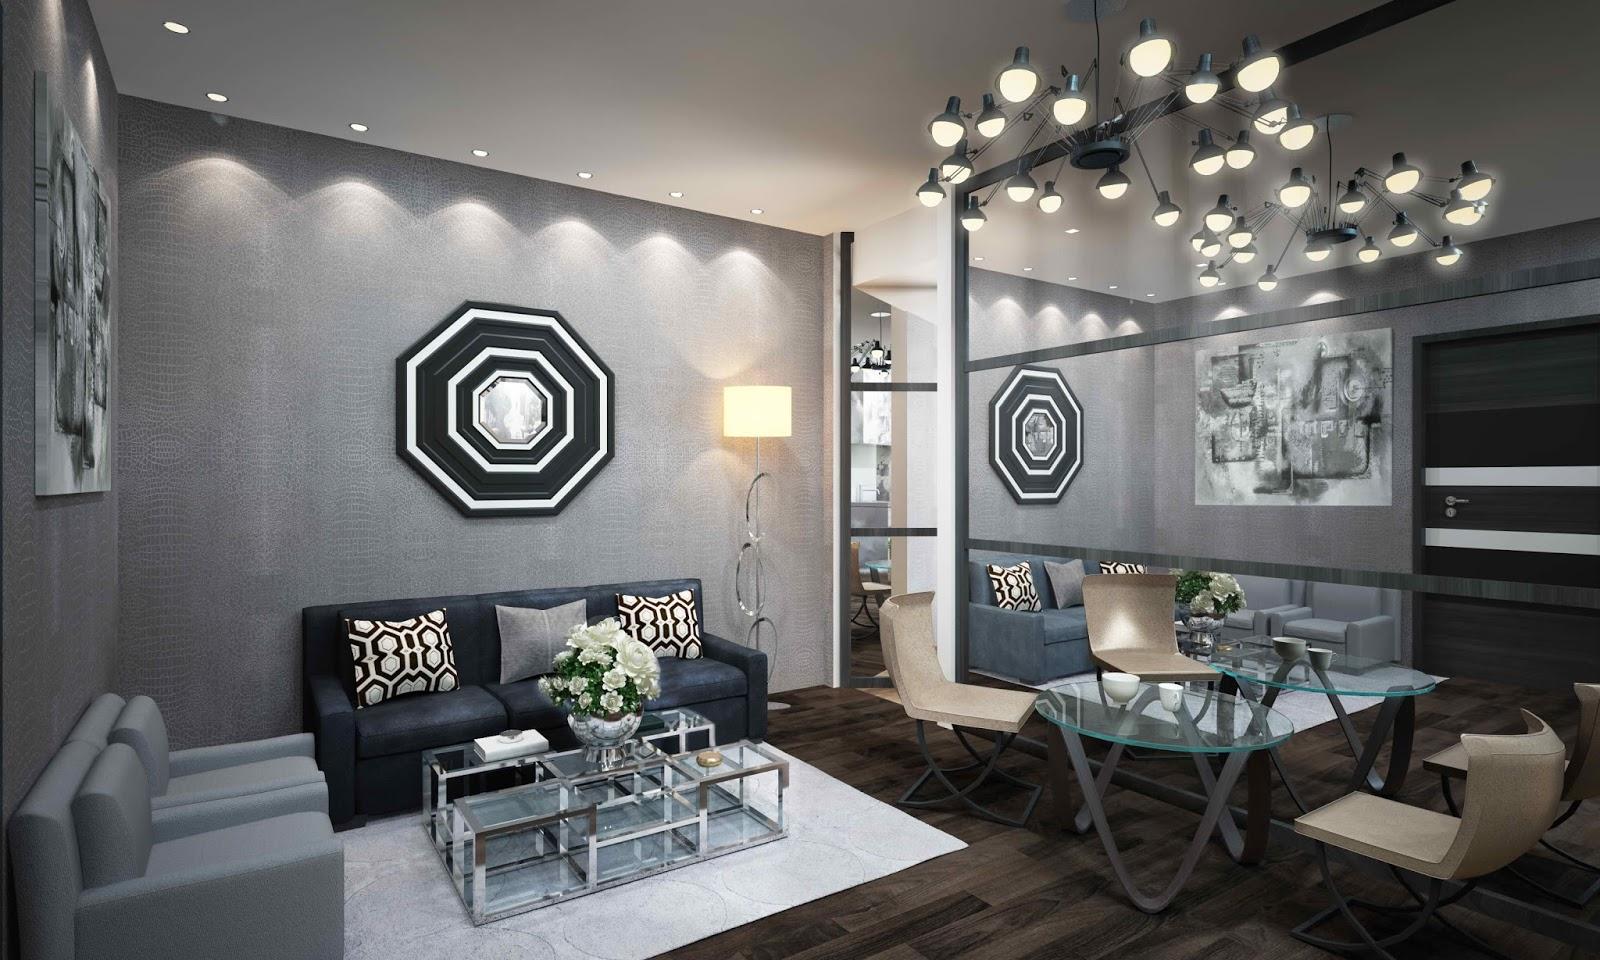 interior design top interior design firms top interior designers worldwide top interior designers websites top interior designers world top interior designers washington dc best interior design w